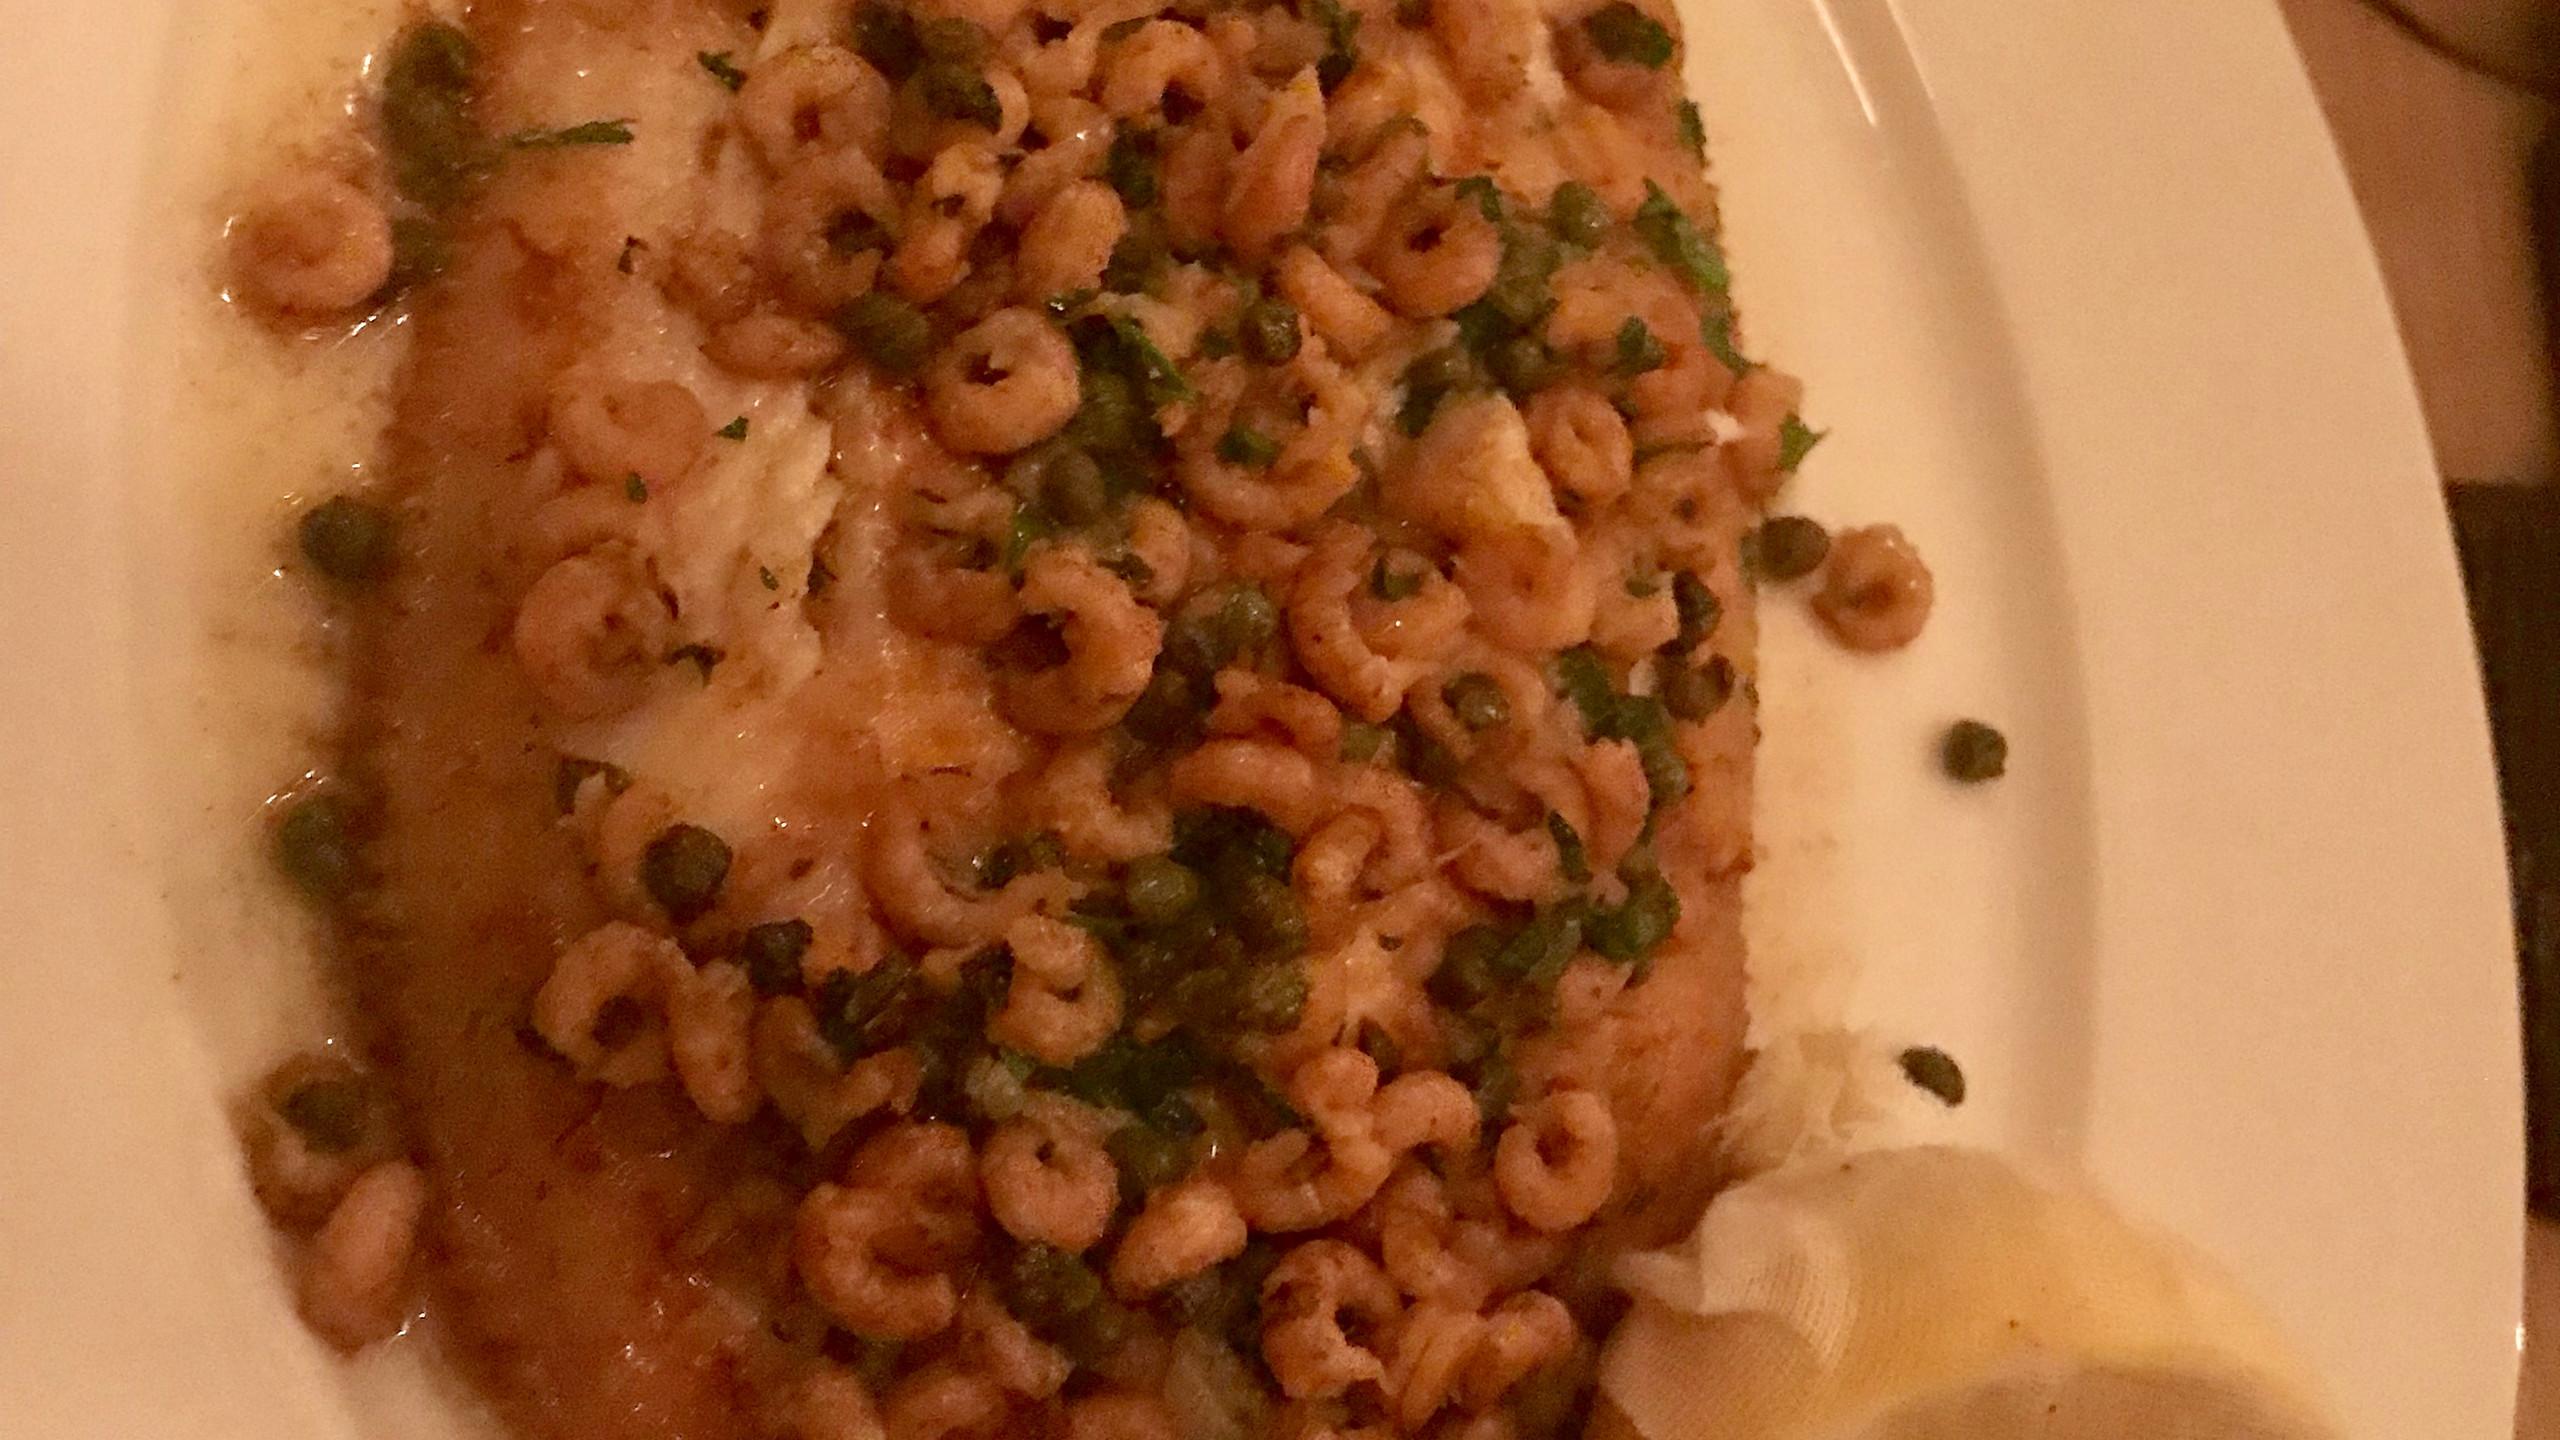 Roasted lemon sole with brown shrimp